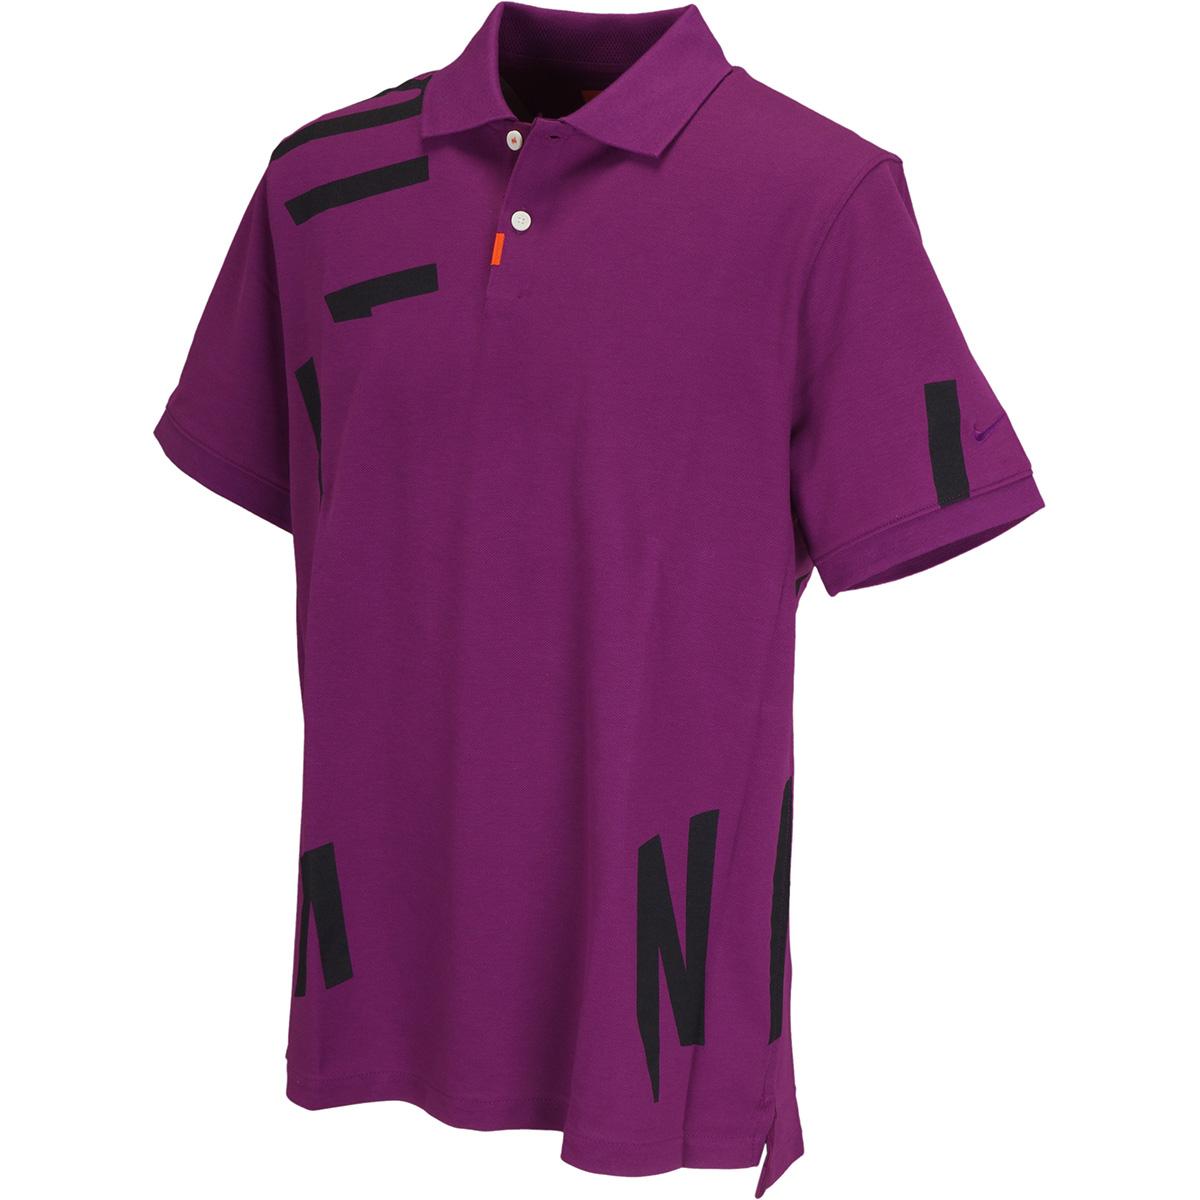 GLF HCKD 半袖ポロシャツ